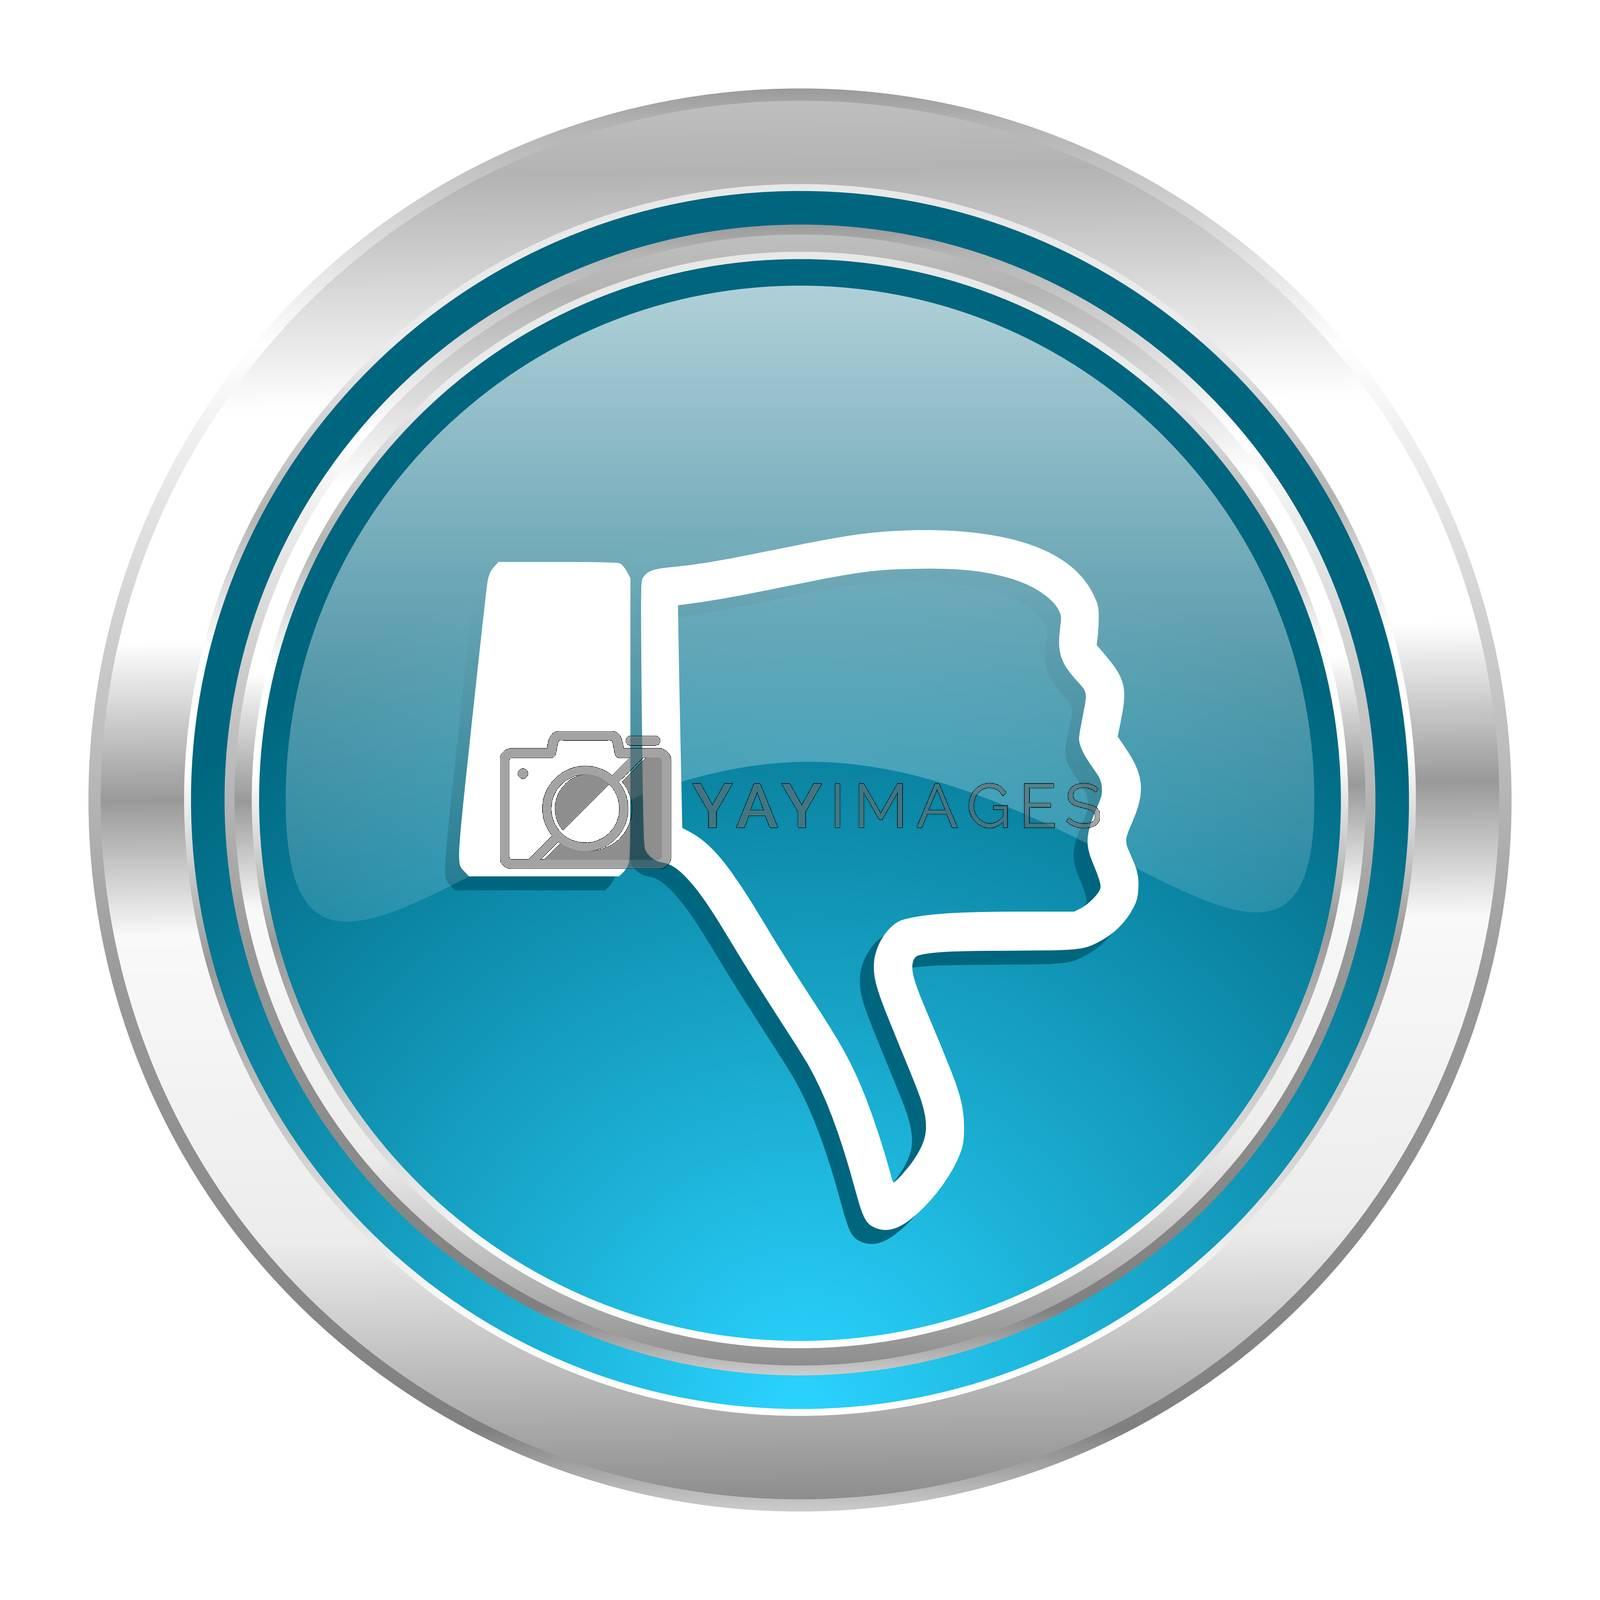 dislike icon, thumb down sign